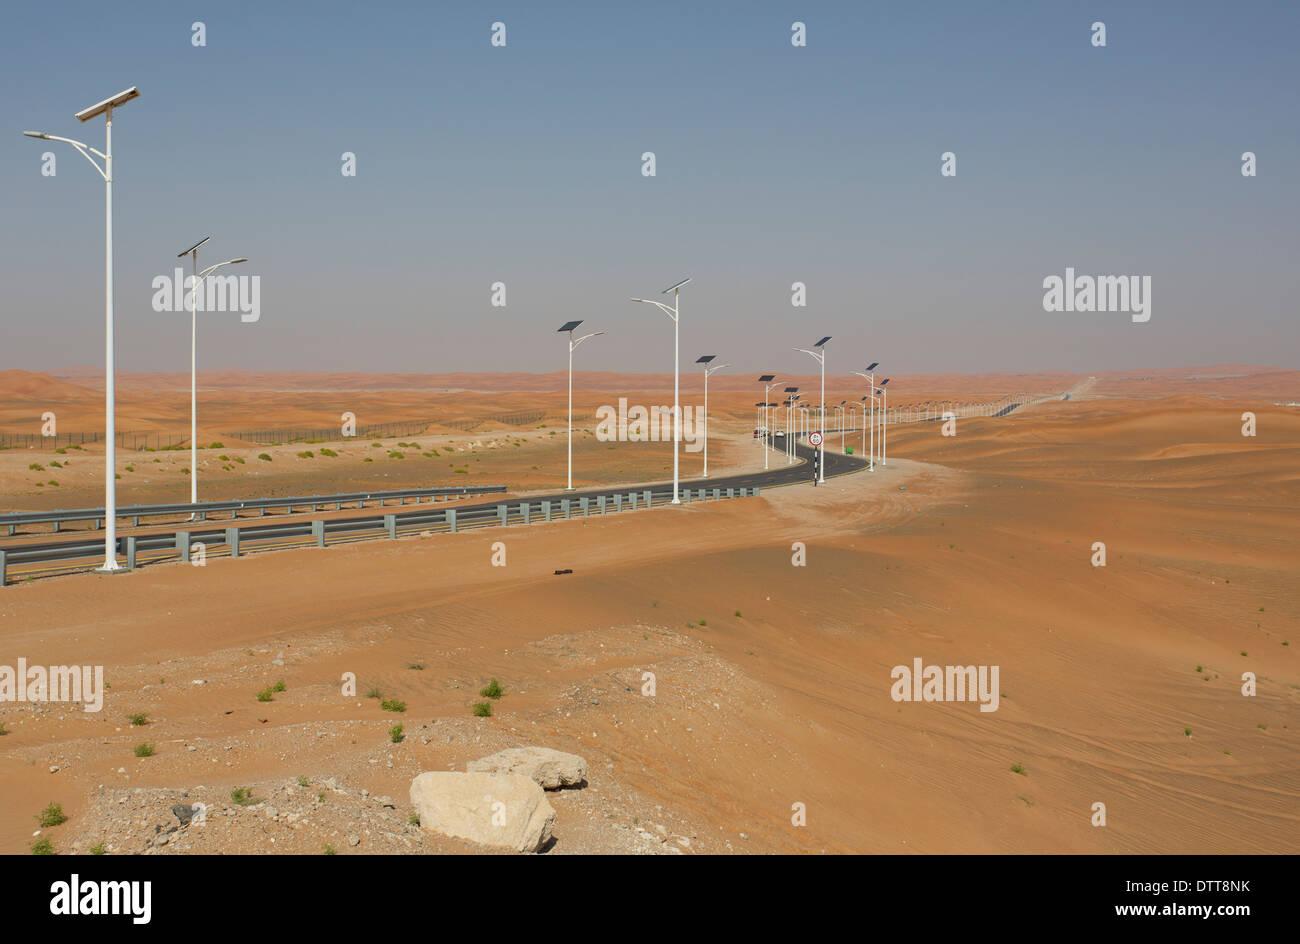 A desert road near Al Ain in the UAE - Stock Image